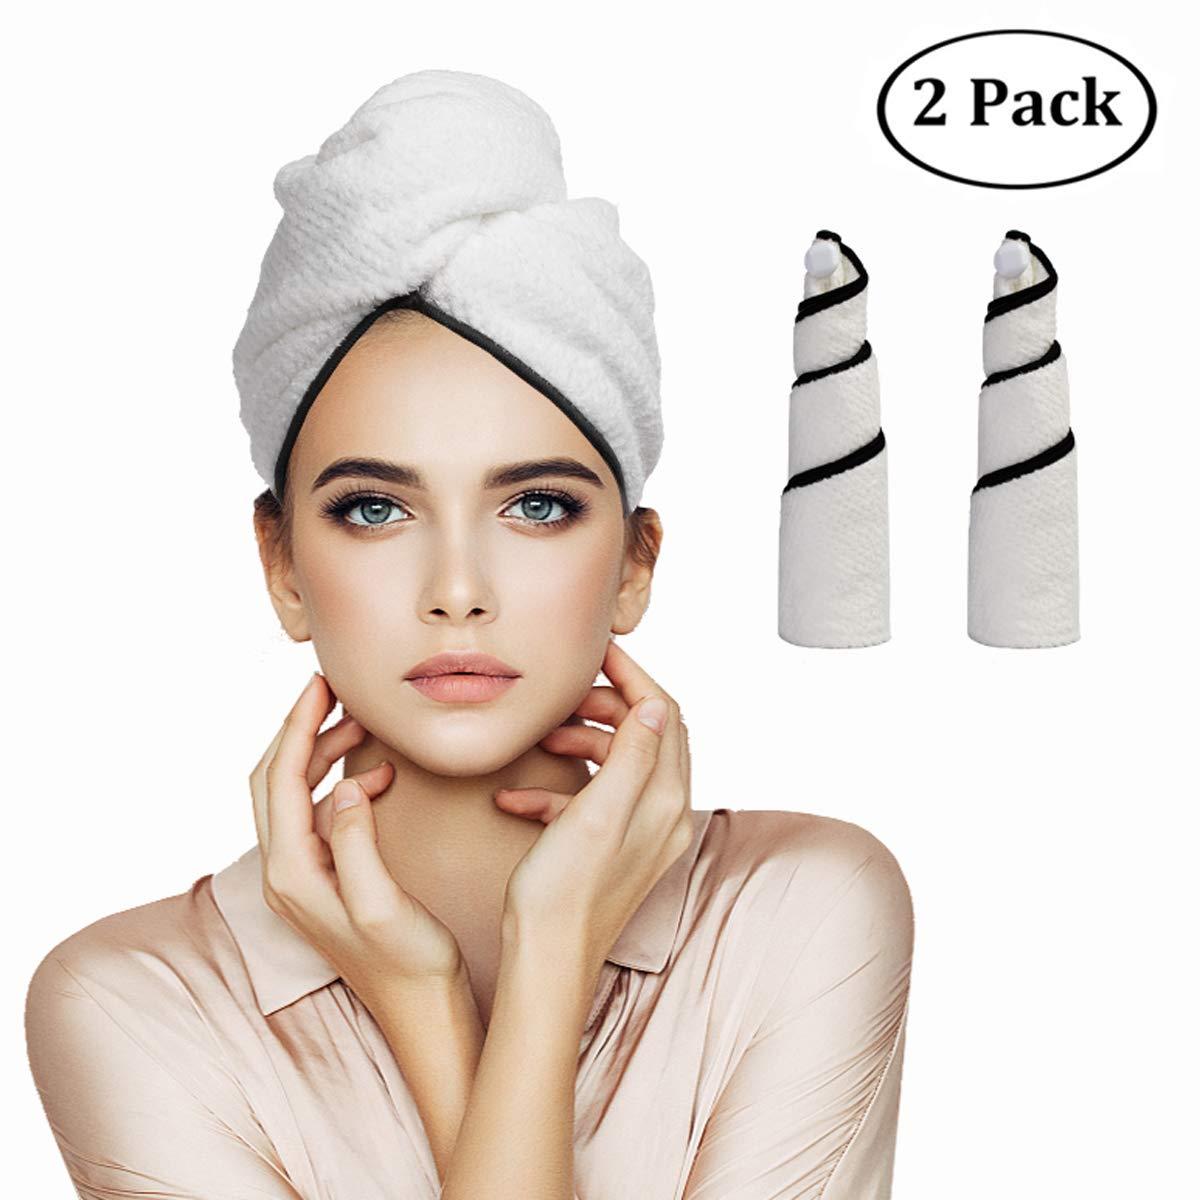 Bath Quick Dry Hair Bath Hat Cap Super Absorbent Microfiber Towel Thick Turban Random